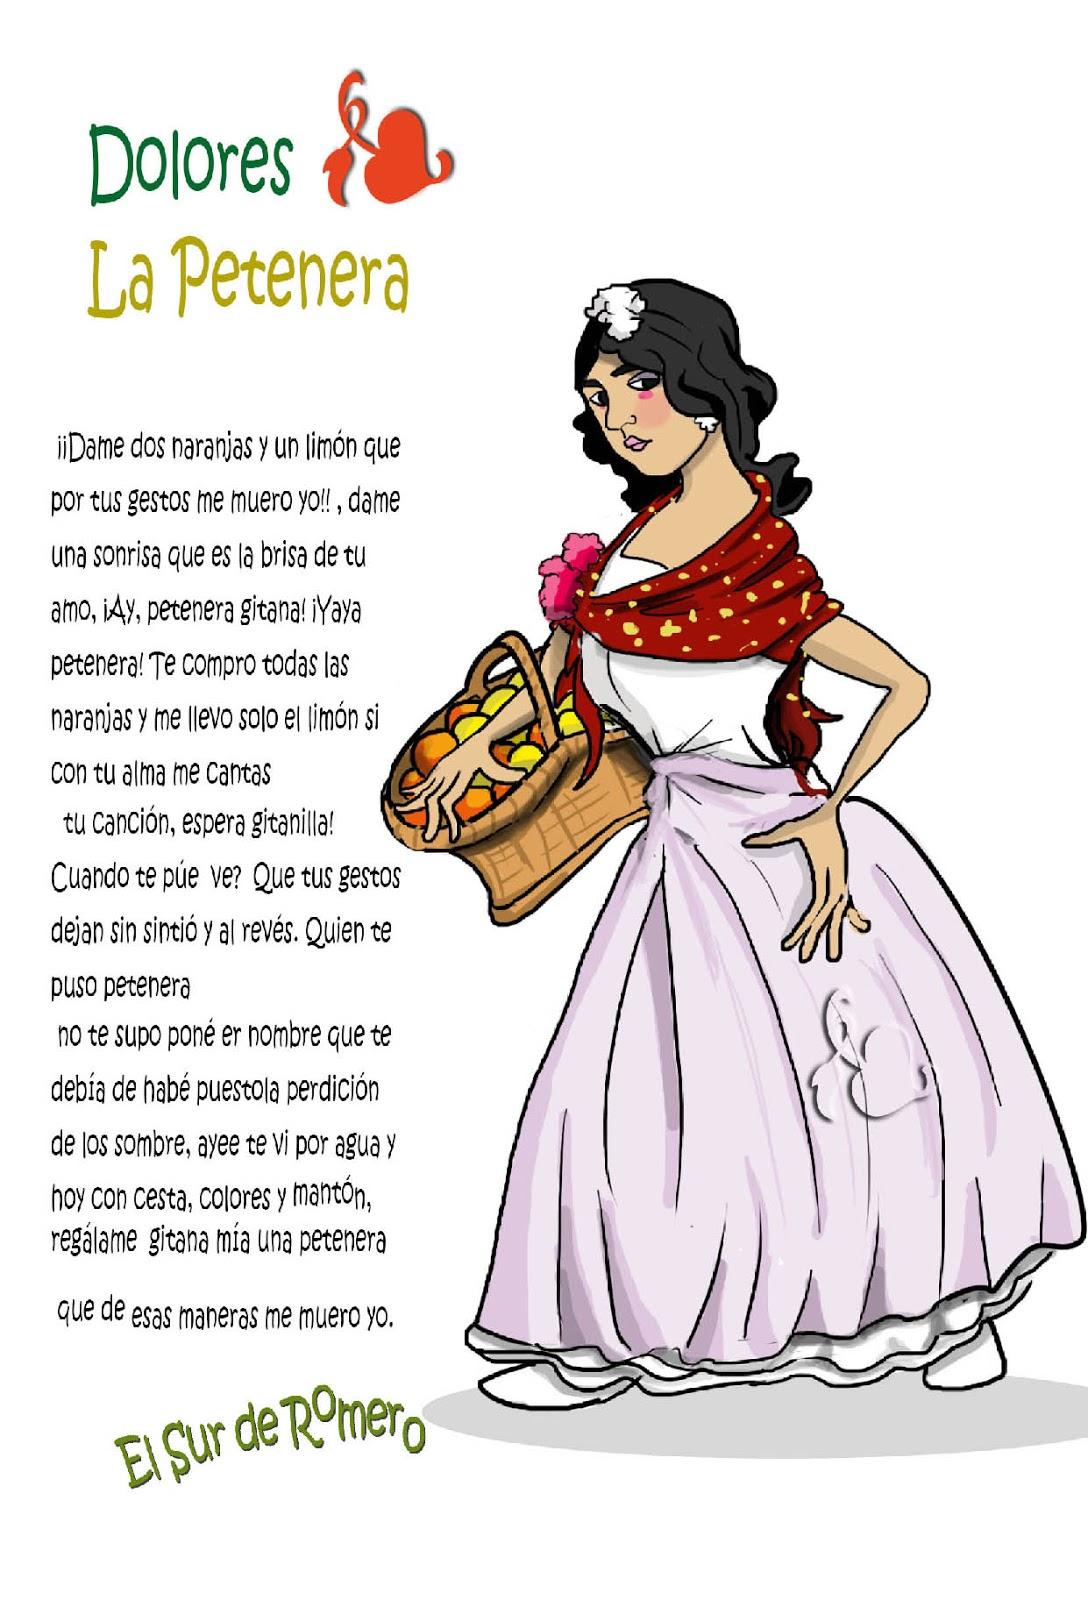 "<img src=""Dolores la Petenera 2.jpg"" alt=""Cantaora de Peteneras en dibujo""/>"